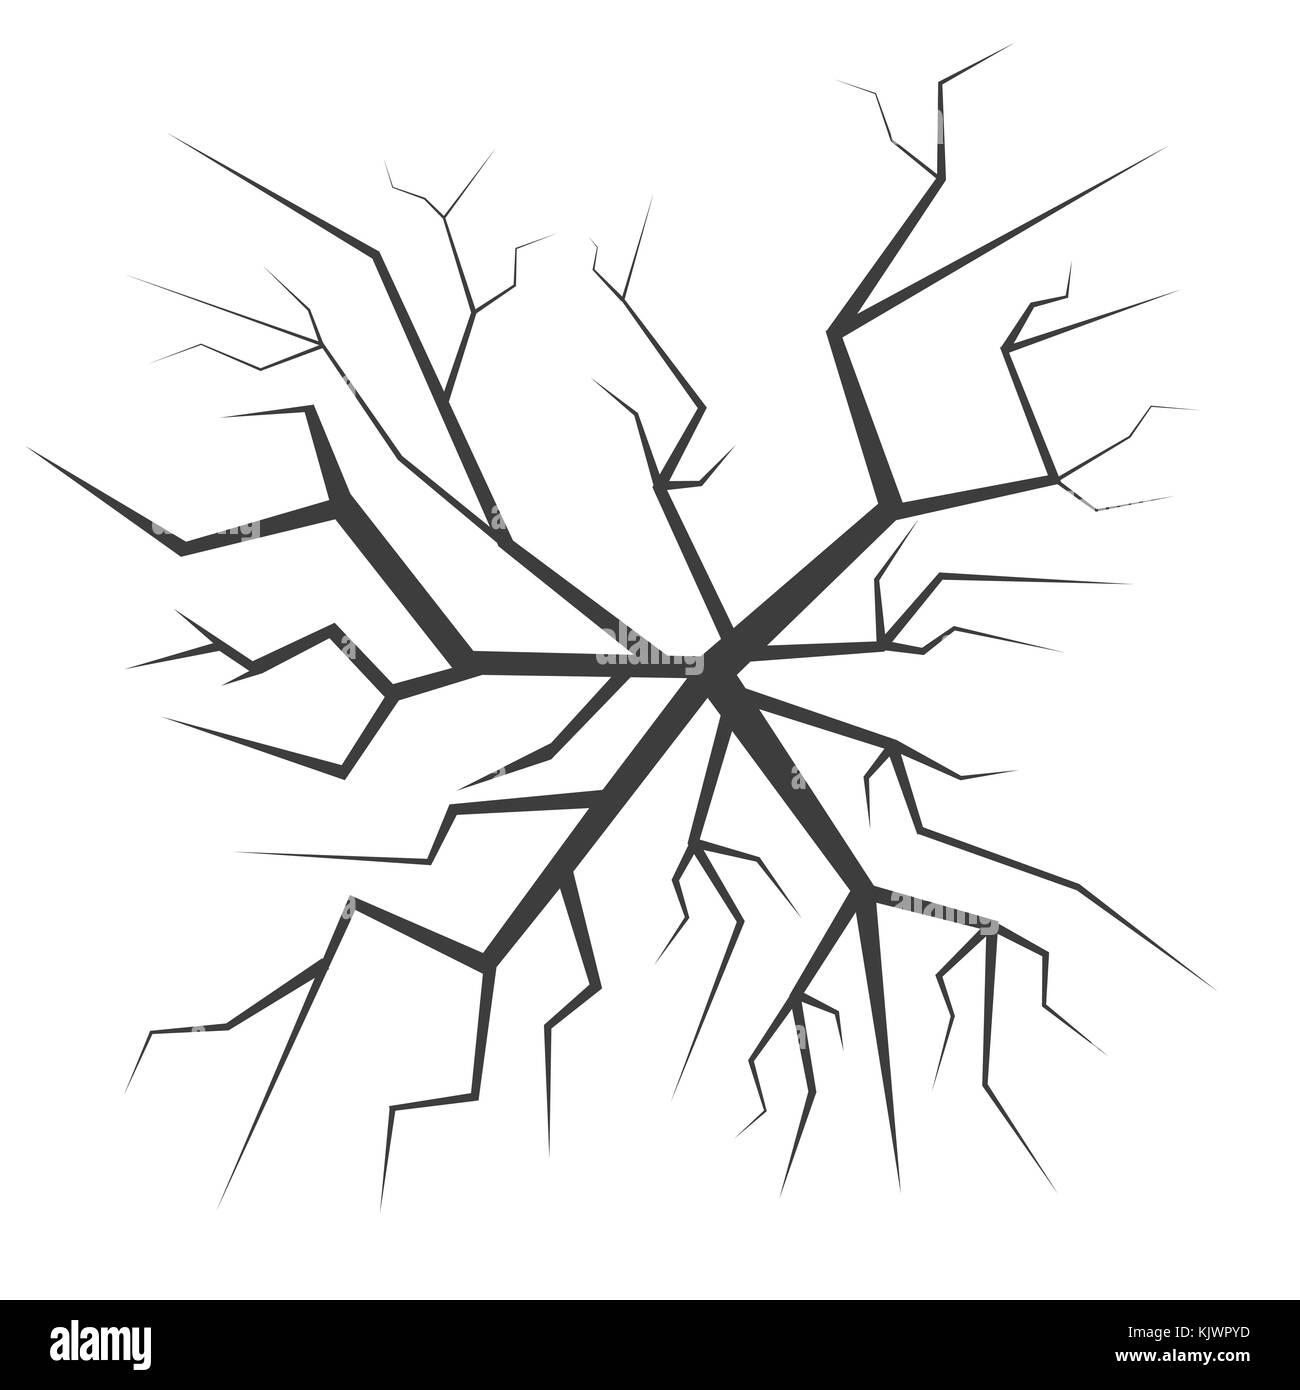 Cracked backgrond illustration - Stock Image